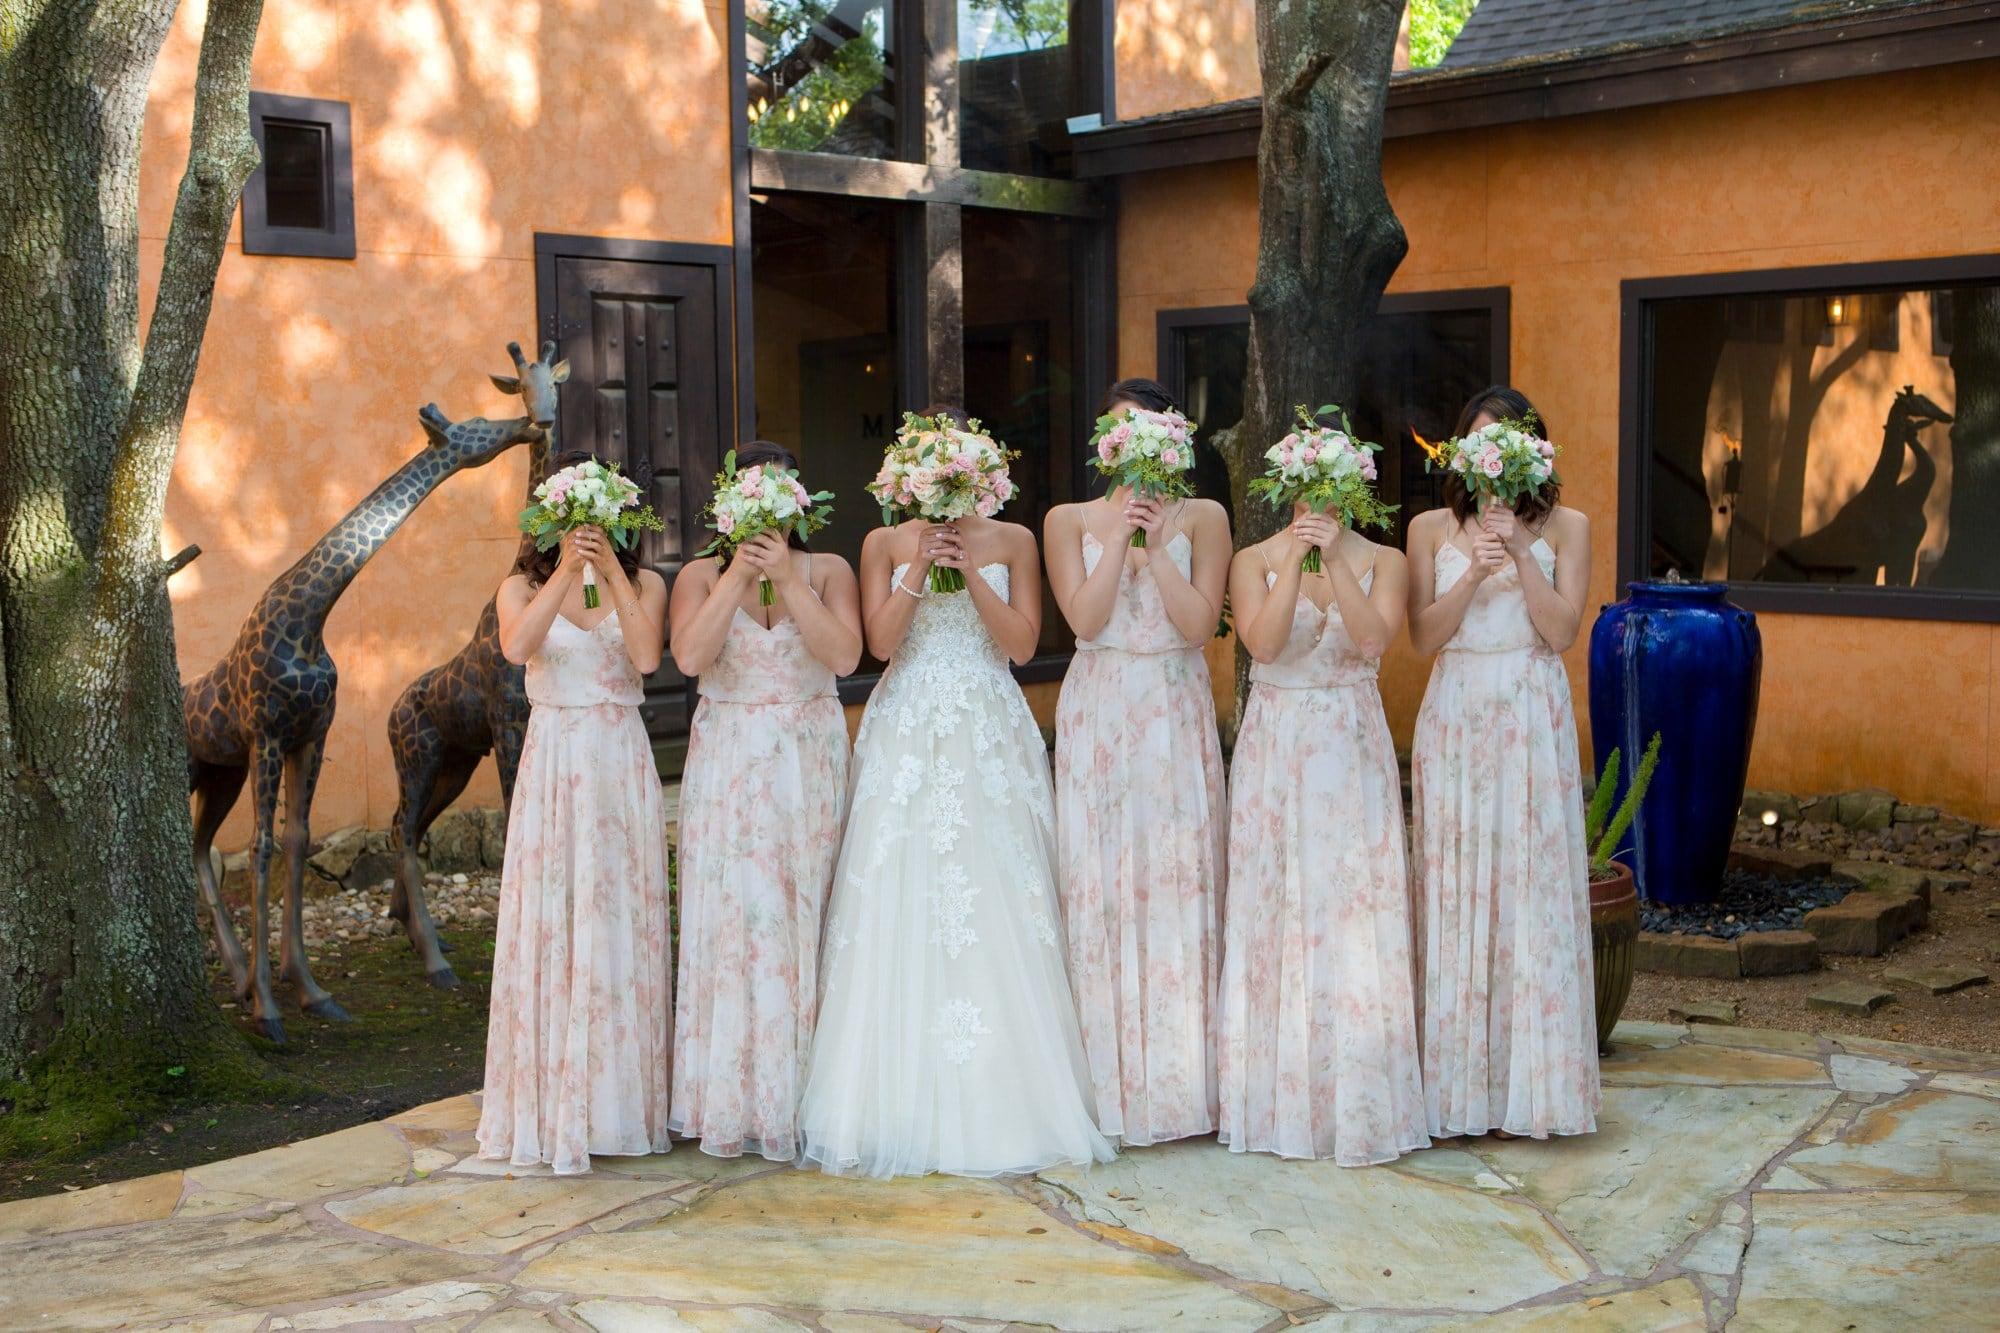 women in white wedding dress standing on gray concrete floor